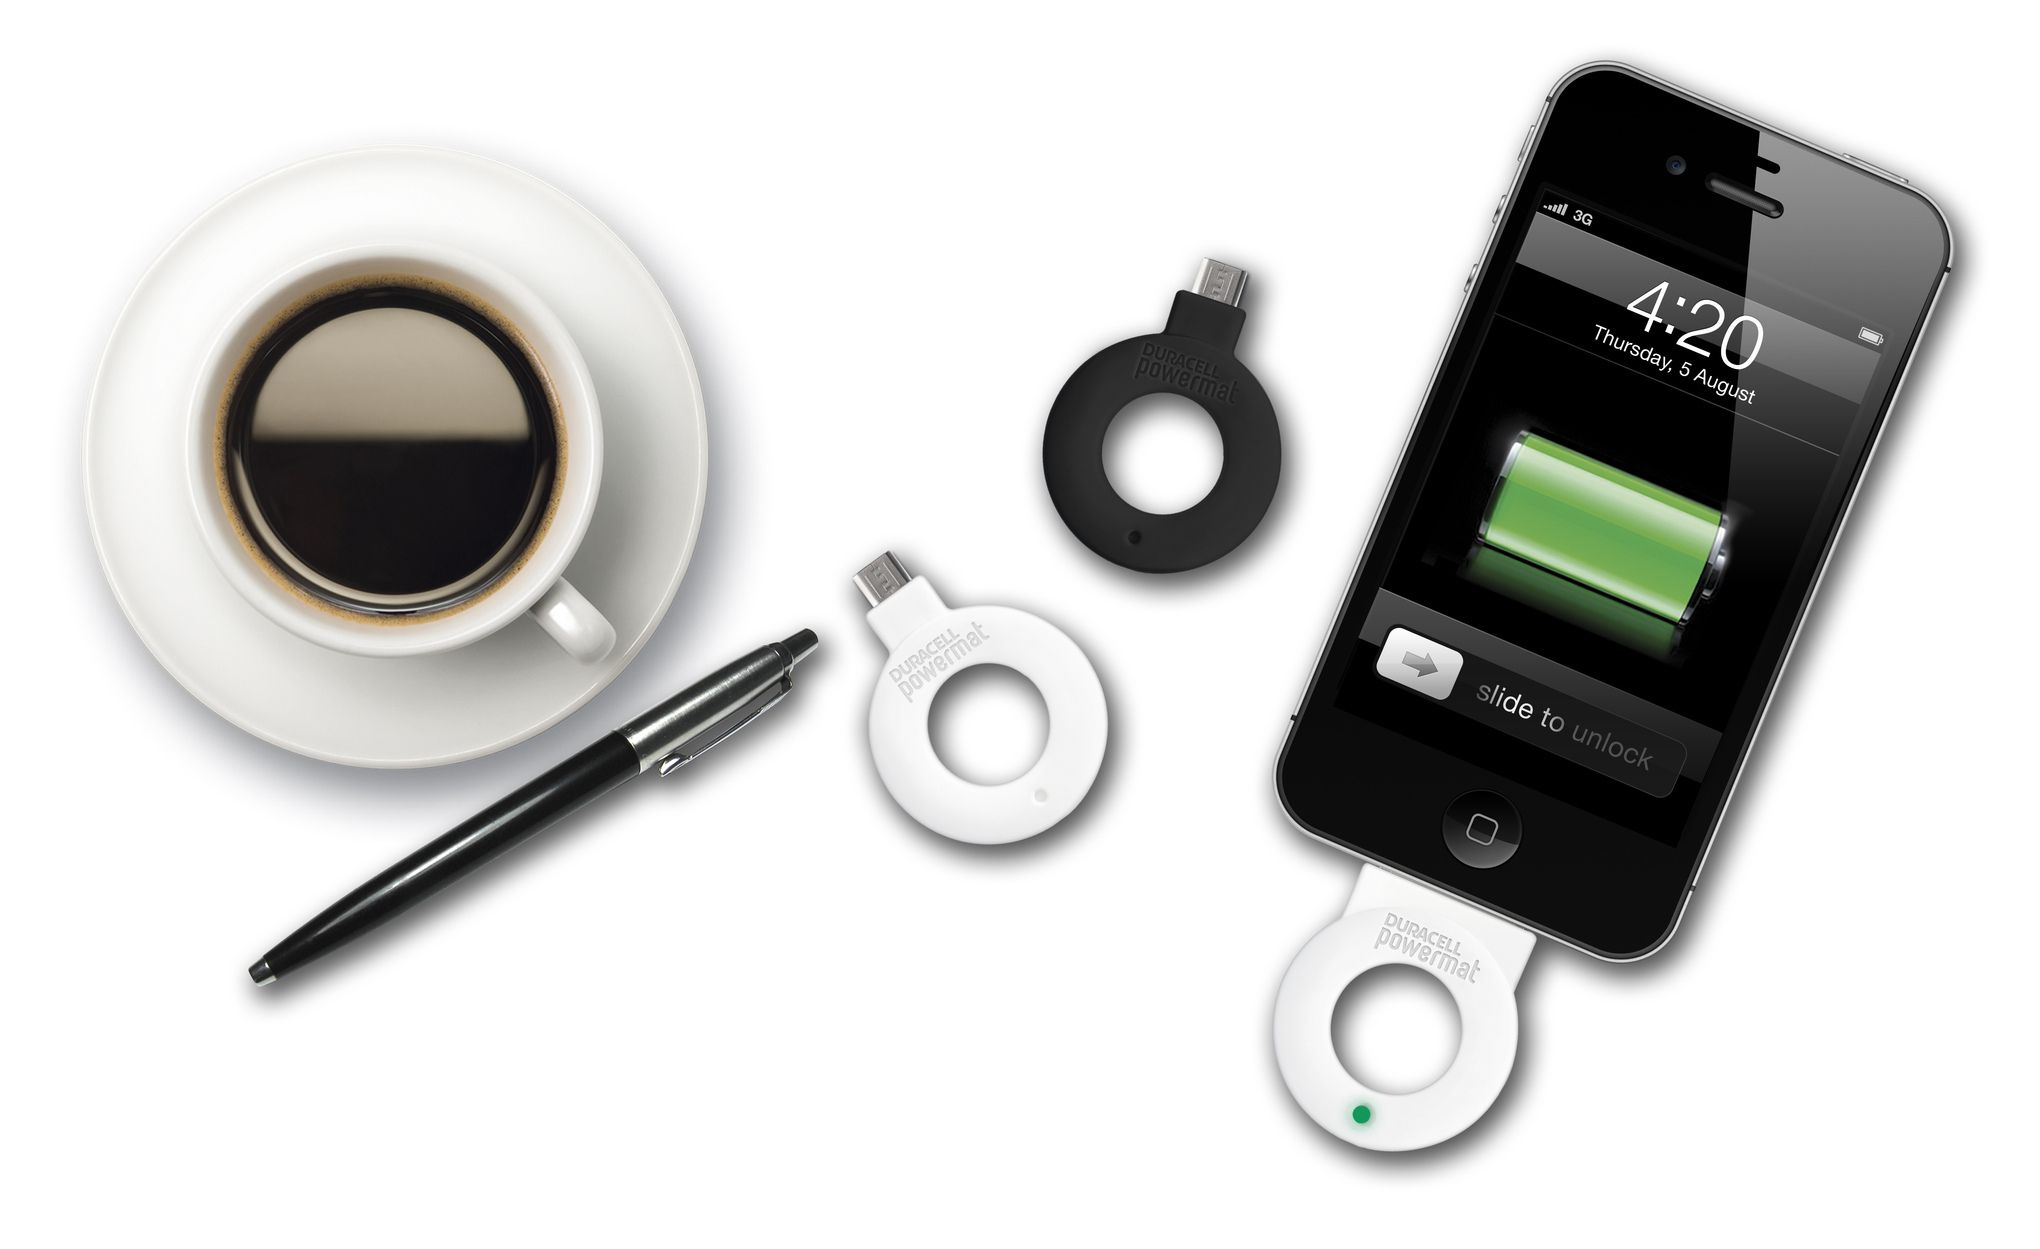 Starbucks US menu updated to include wireless phone